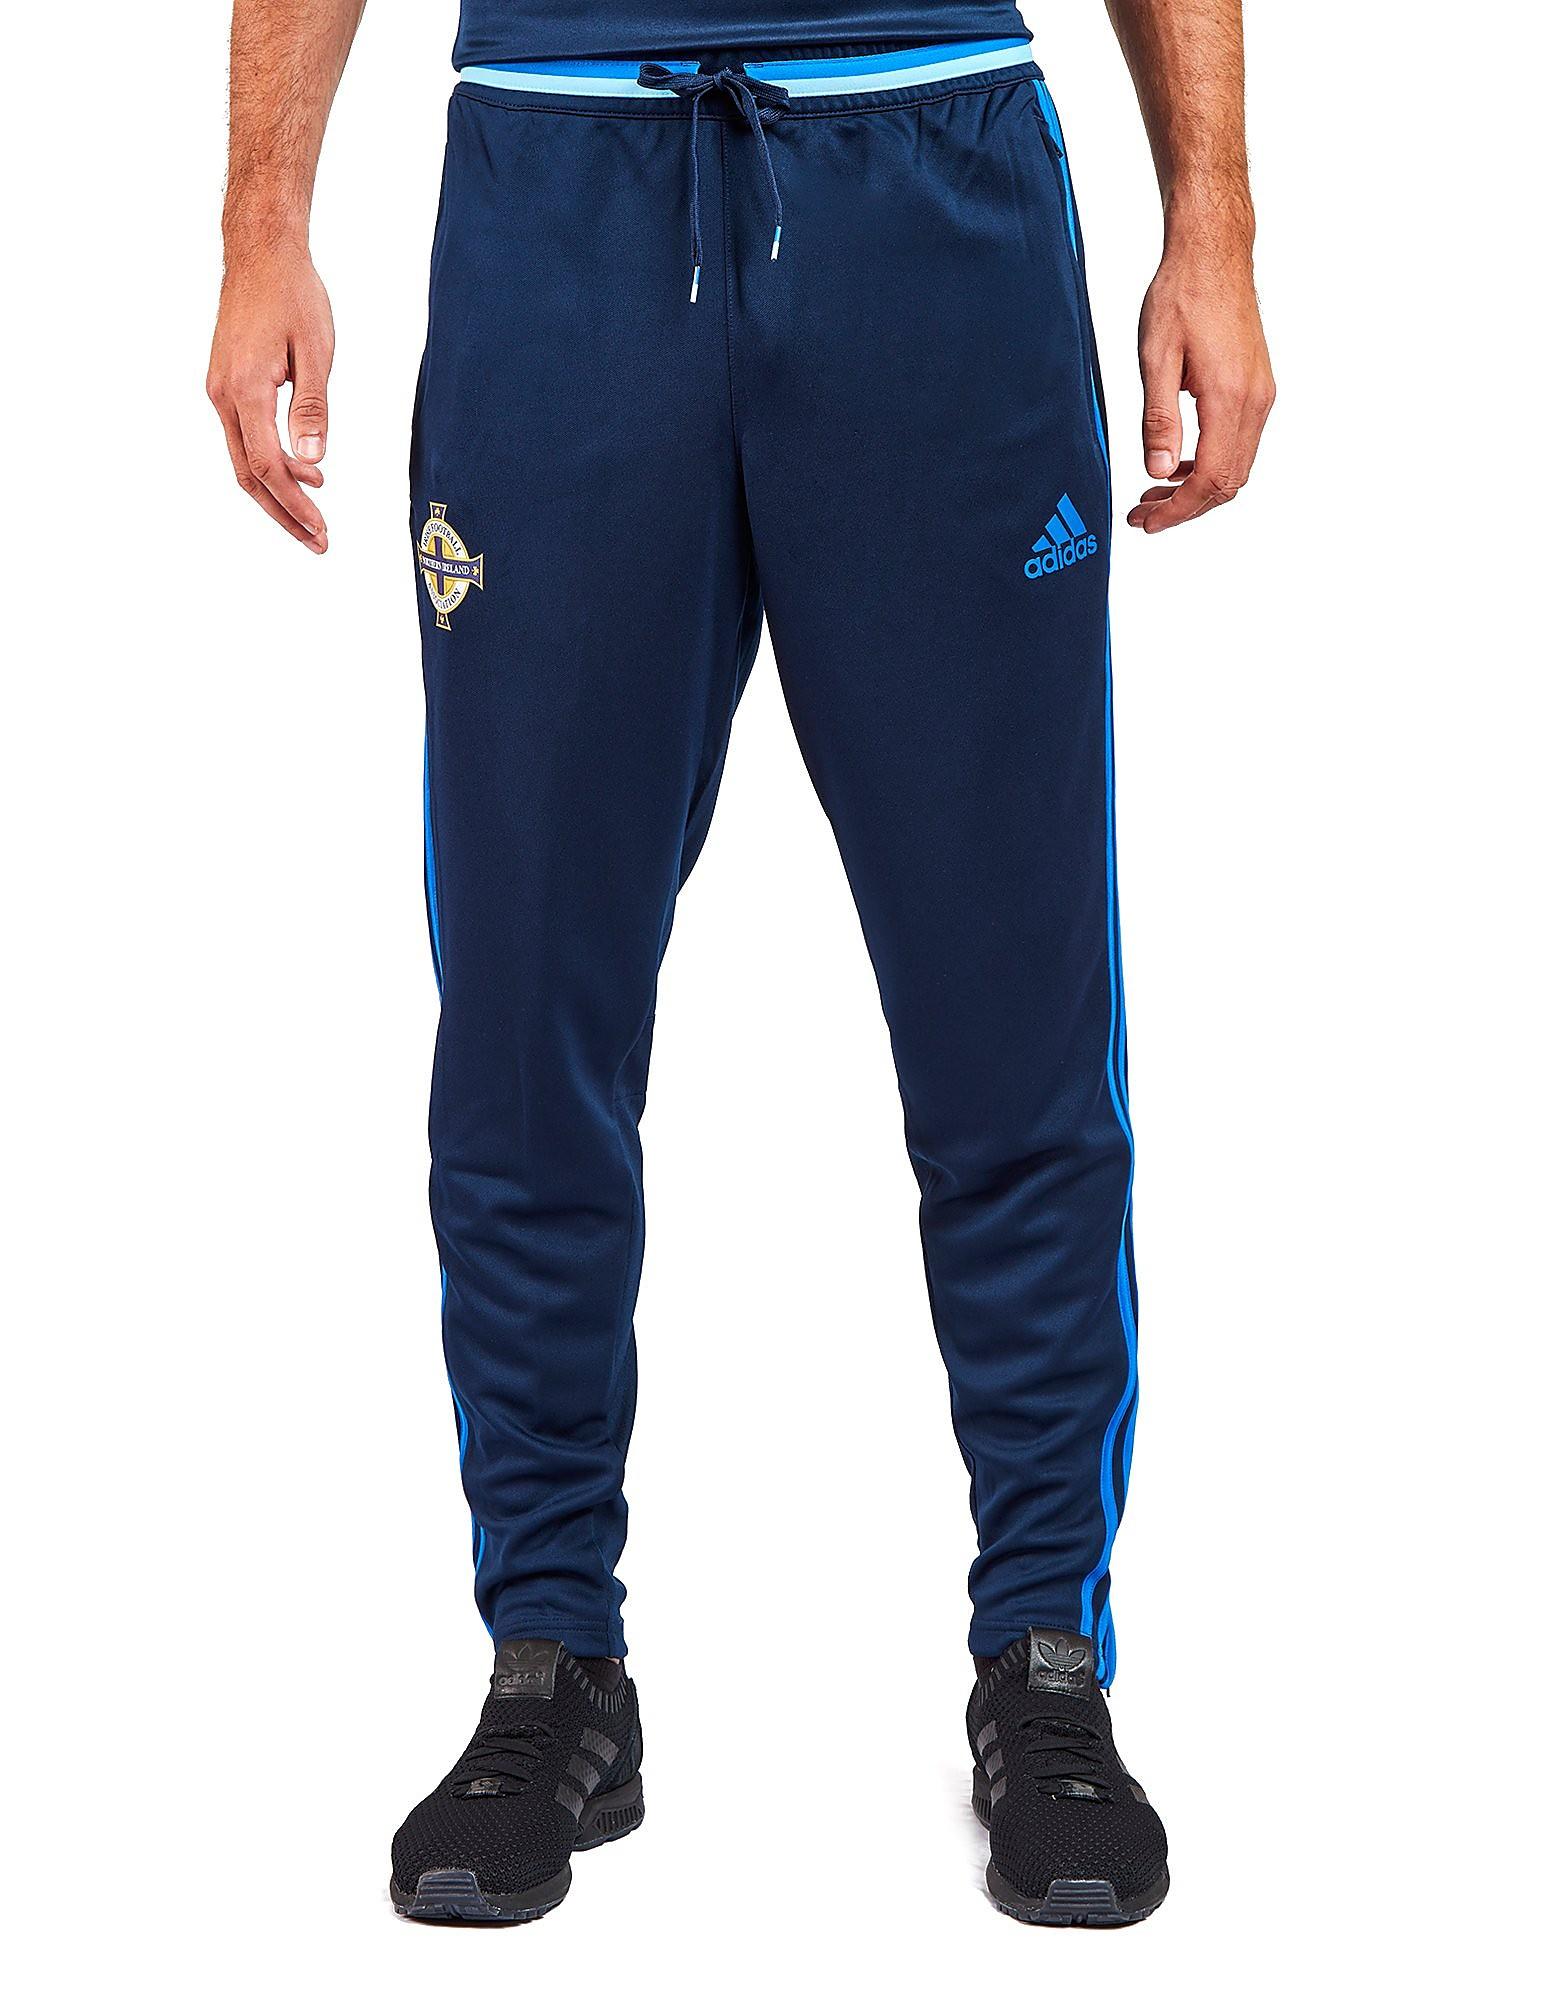 adidas Northern Ireland 2016/17 Training Pants